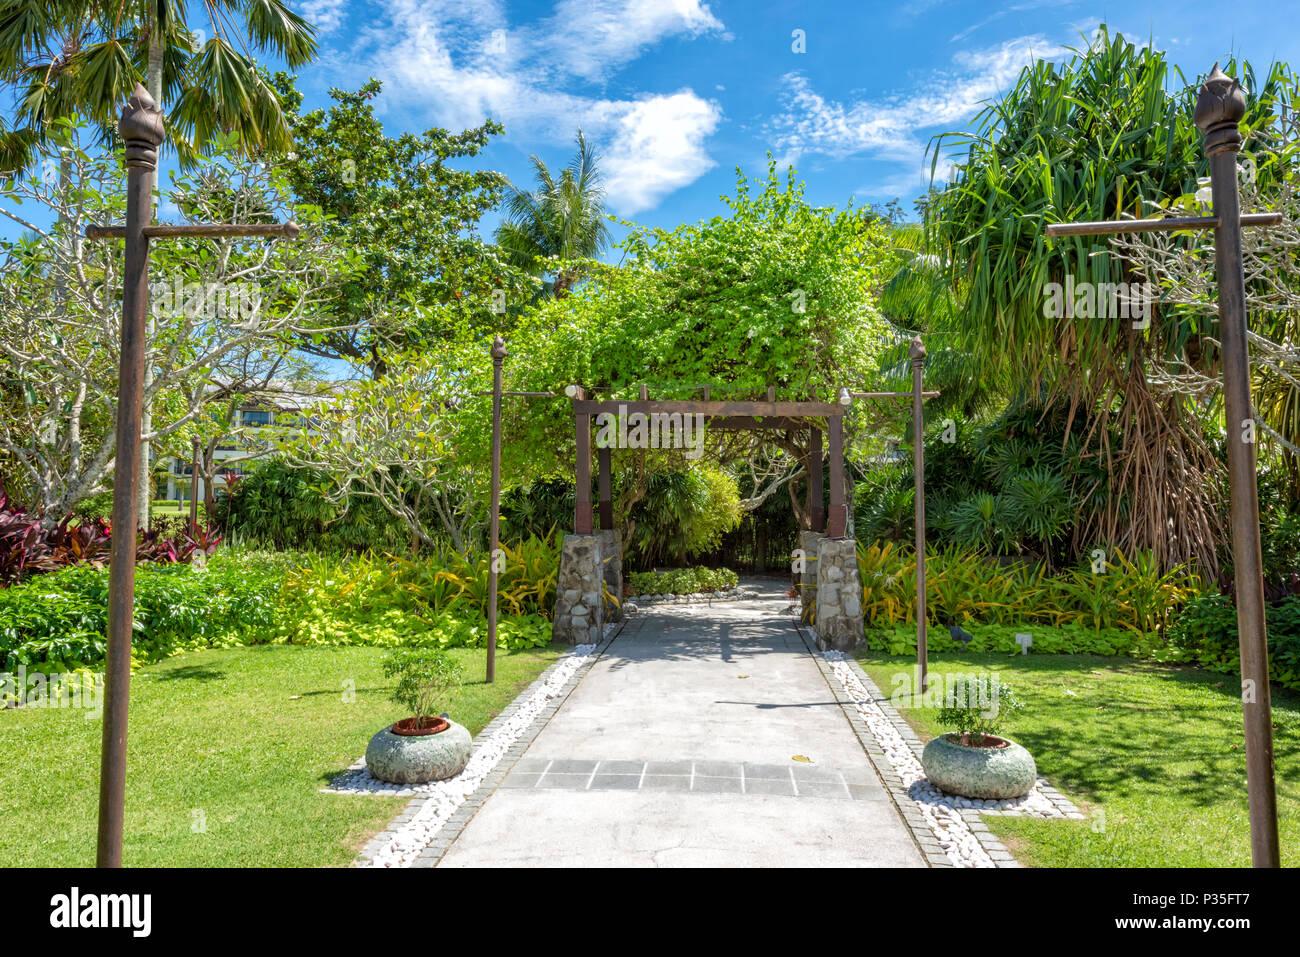 The lush grounds of the Shangri La Rasa Ria Hotel and Resort in Kota Kinabalu, Borneo, Malaysia - Stock Image